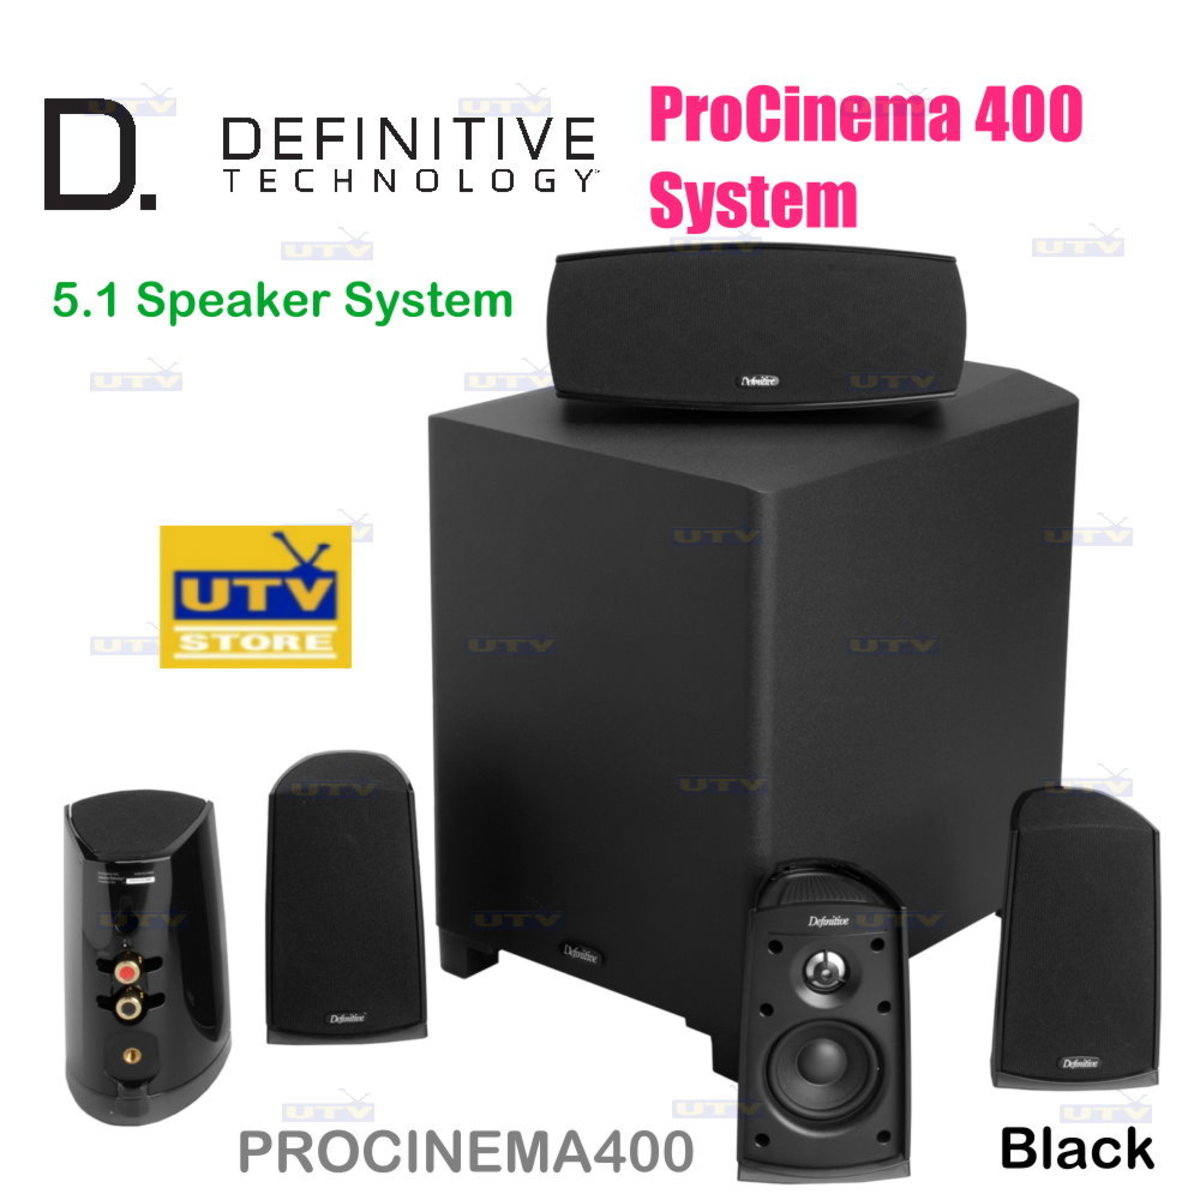 ProCinema 400 Definitive 5.1 Speaker System